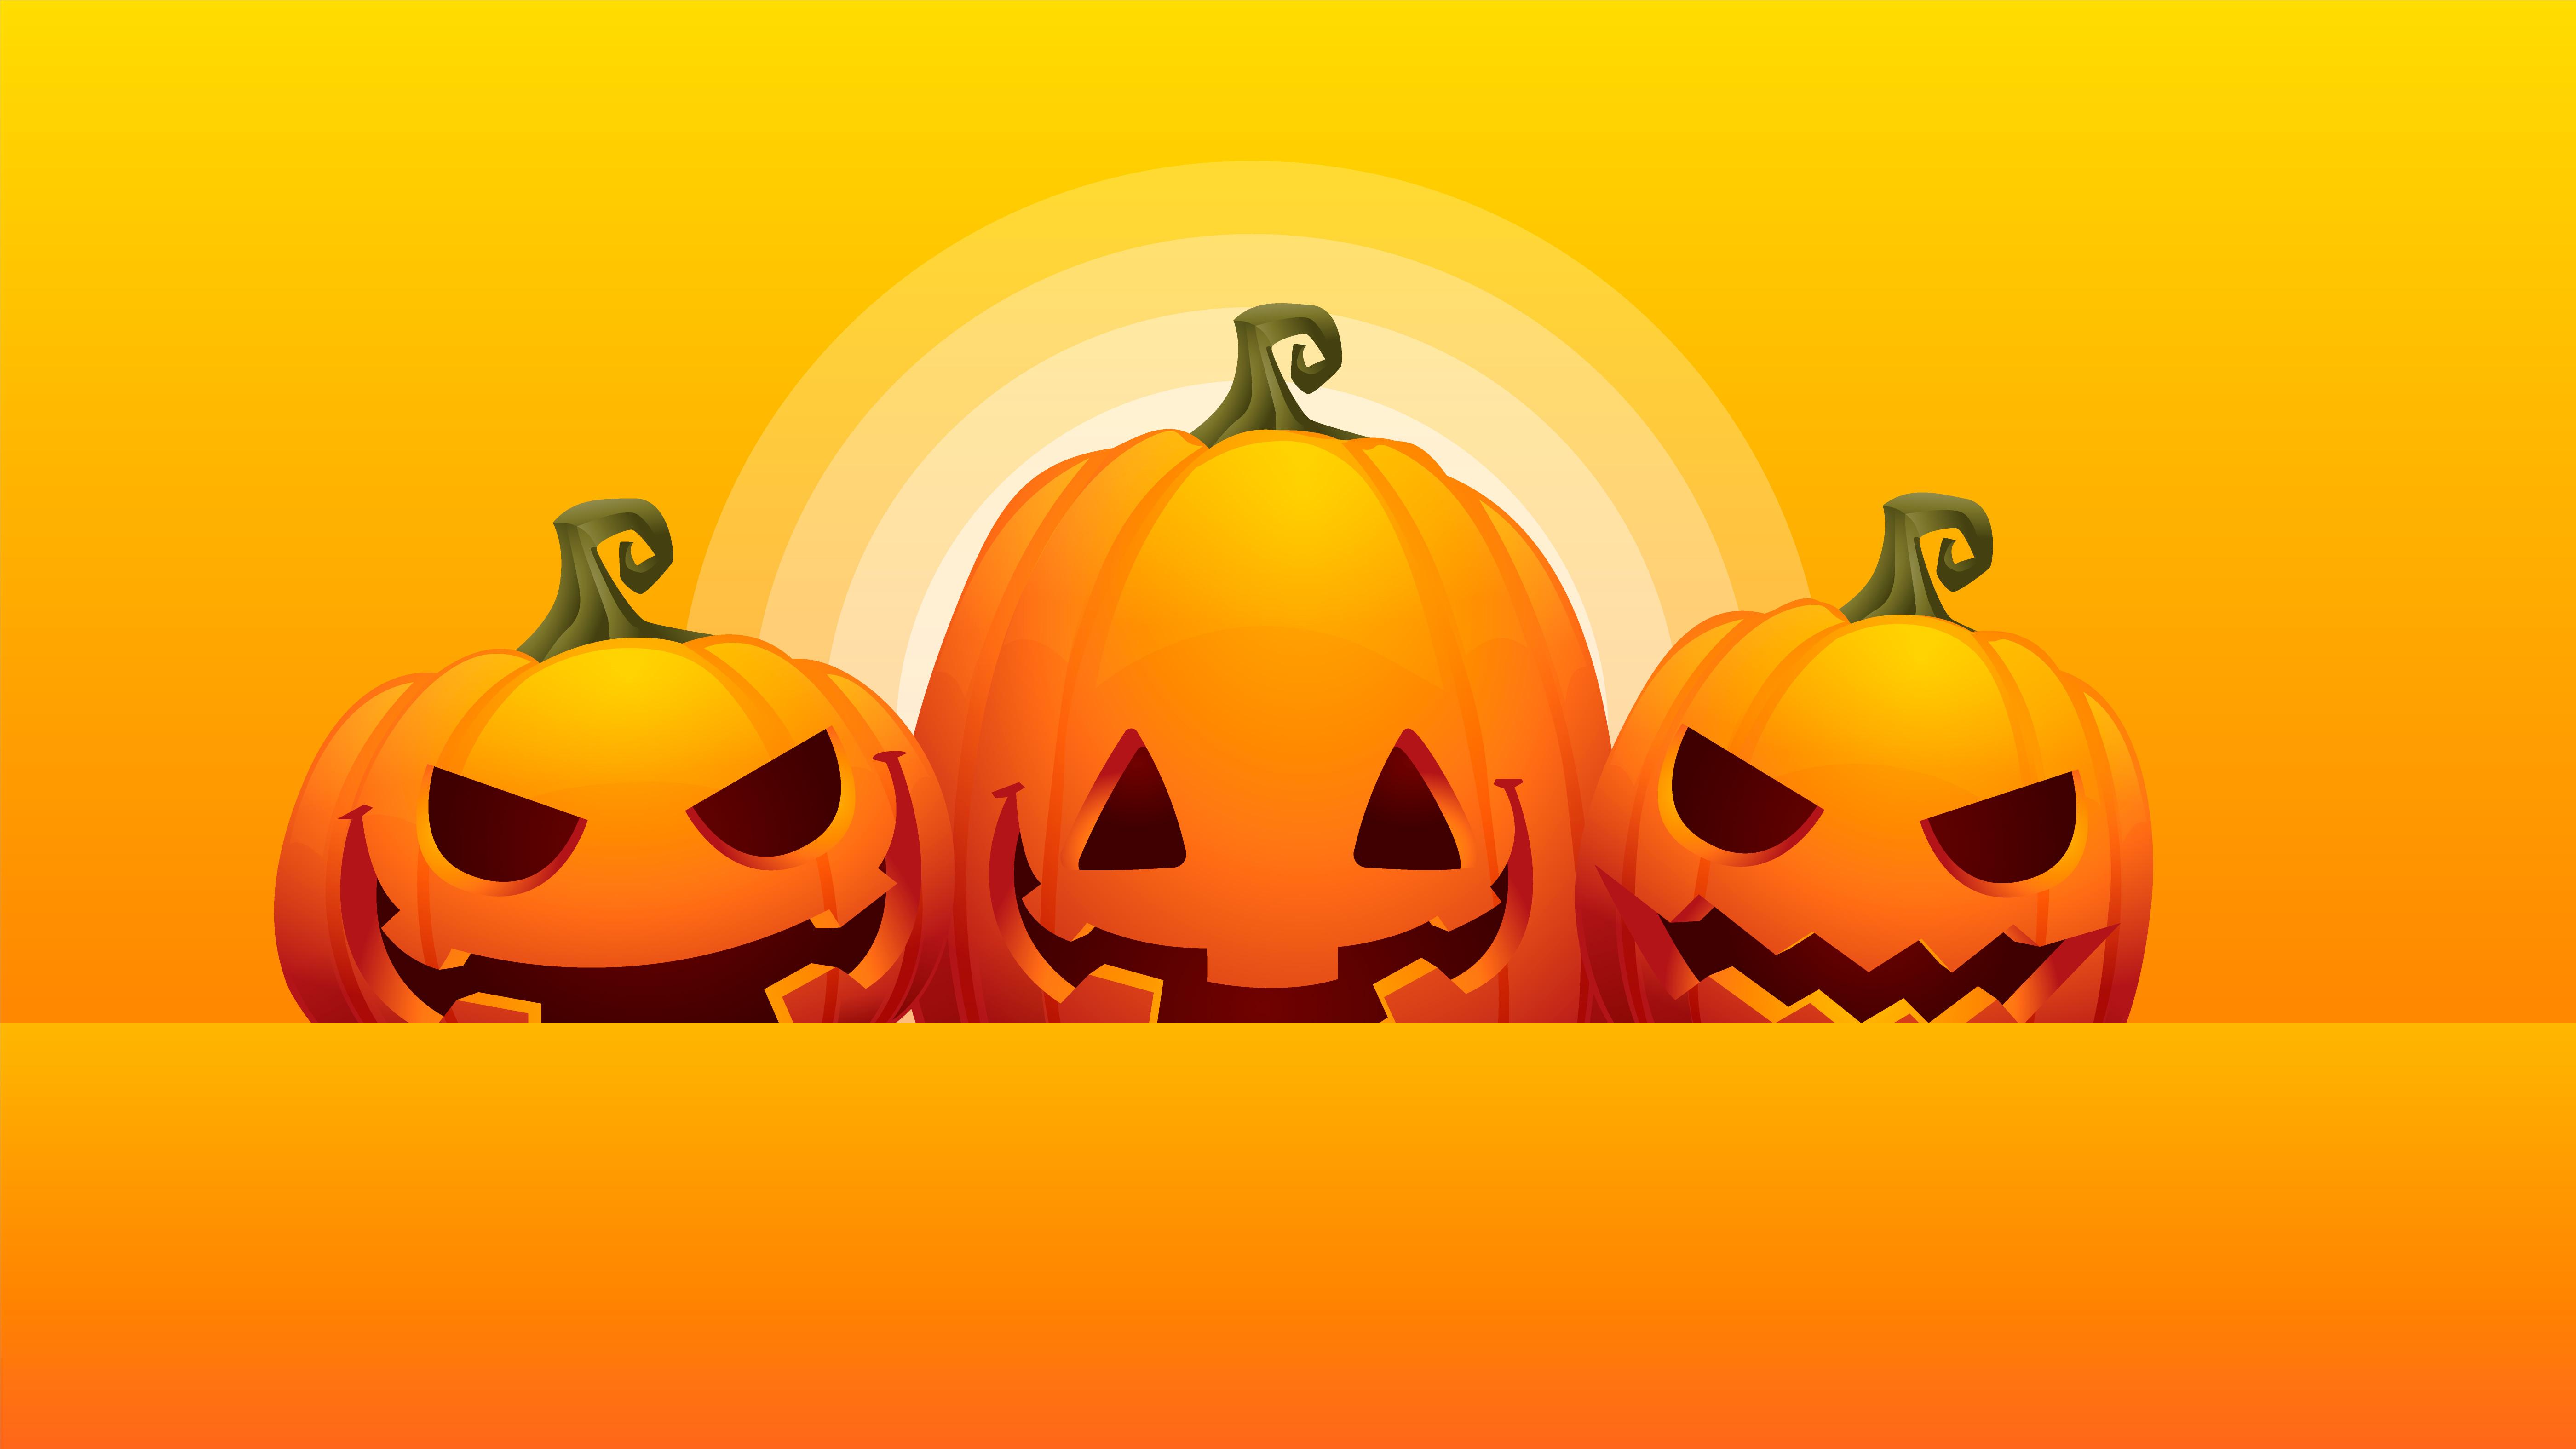 three pumpkins halloween orange background 32 Vector Art at ...